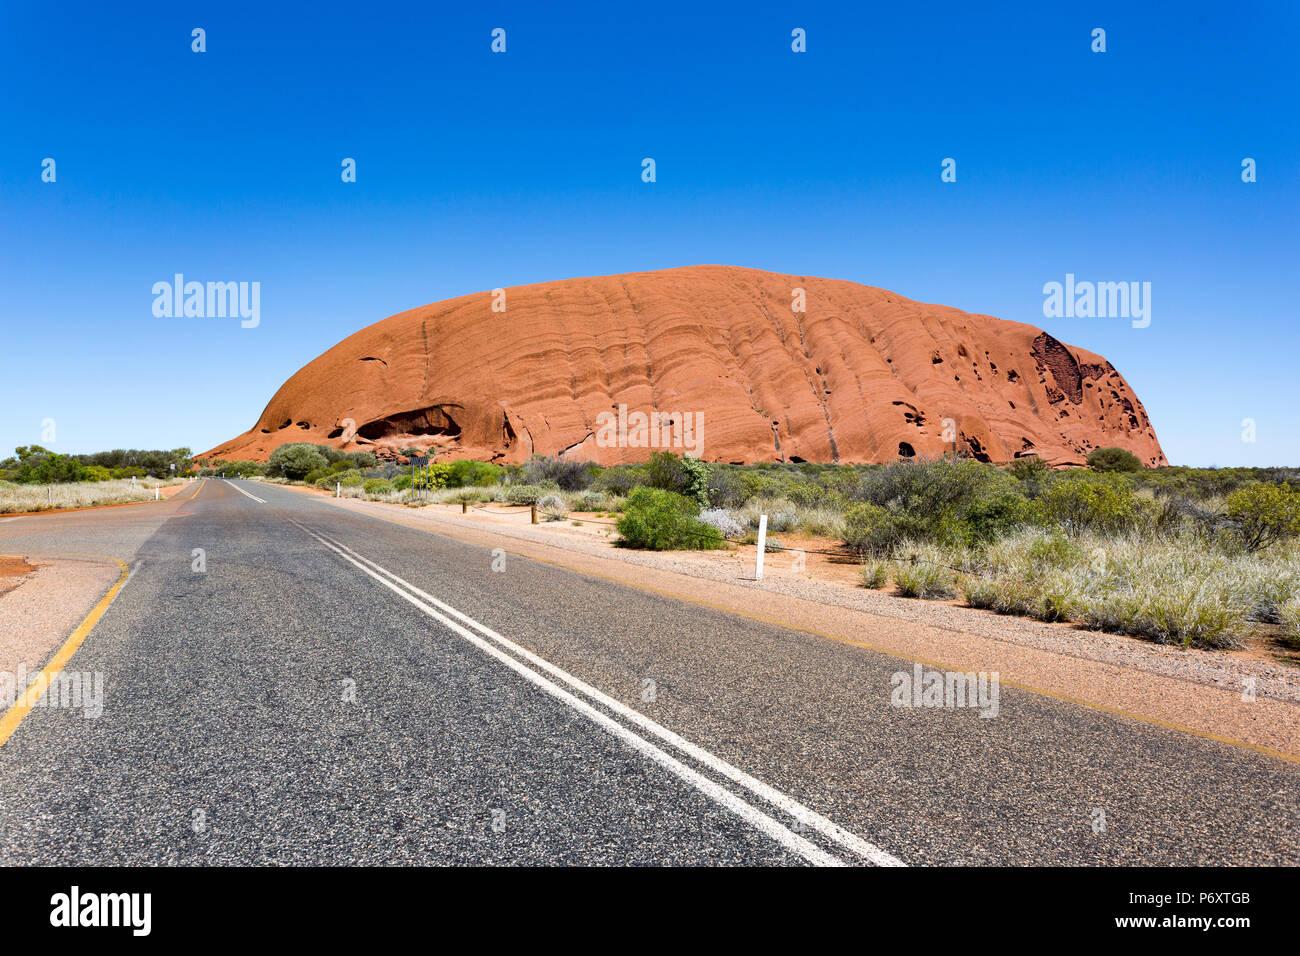 Weg nach Uluru, Northern Territory, Australien. Stockbild